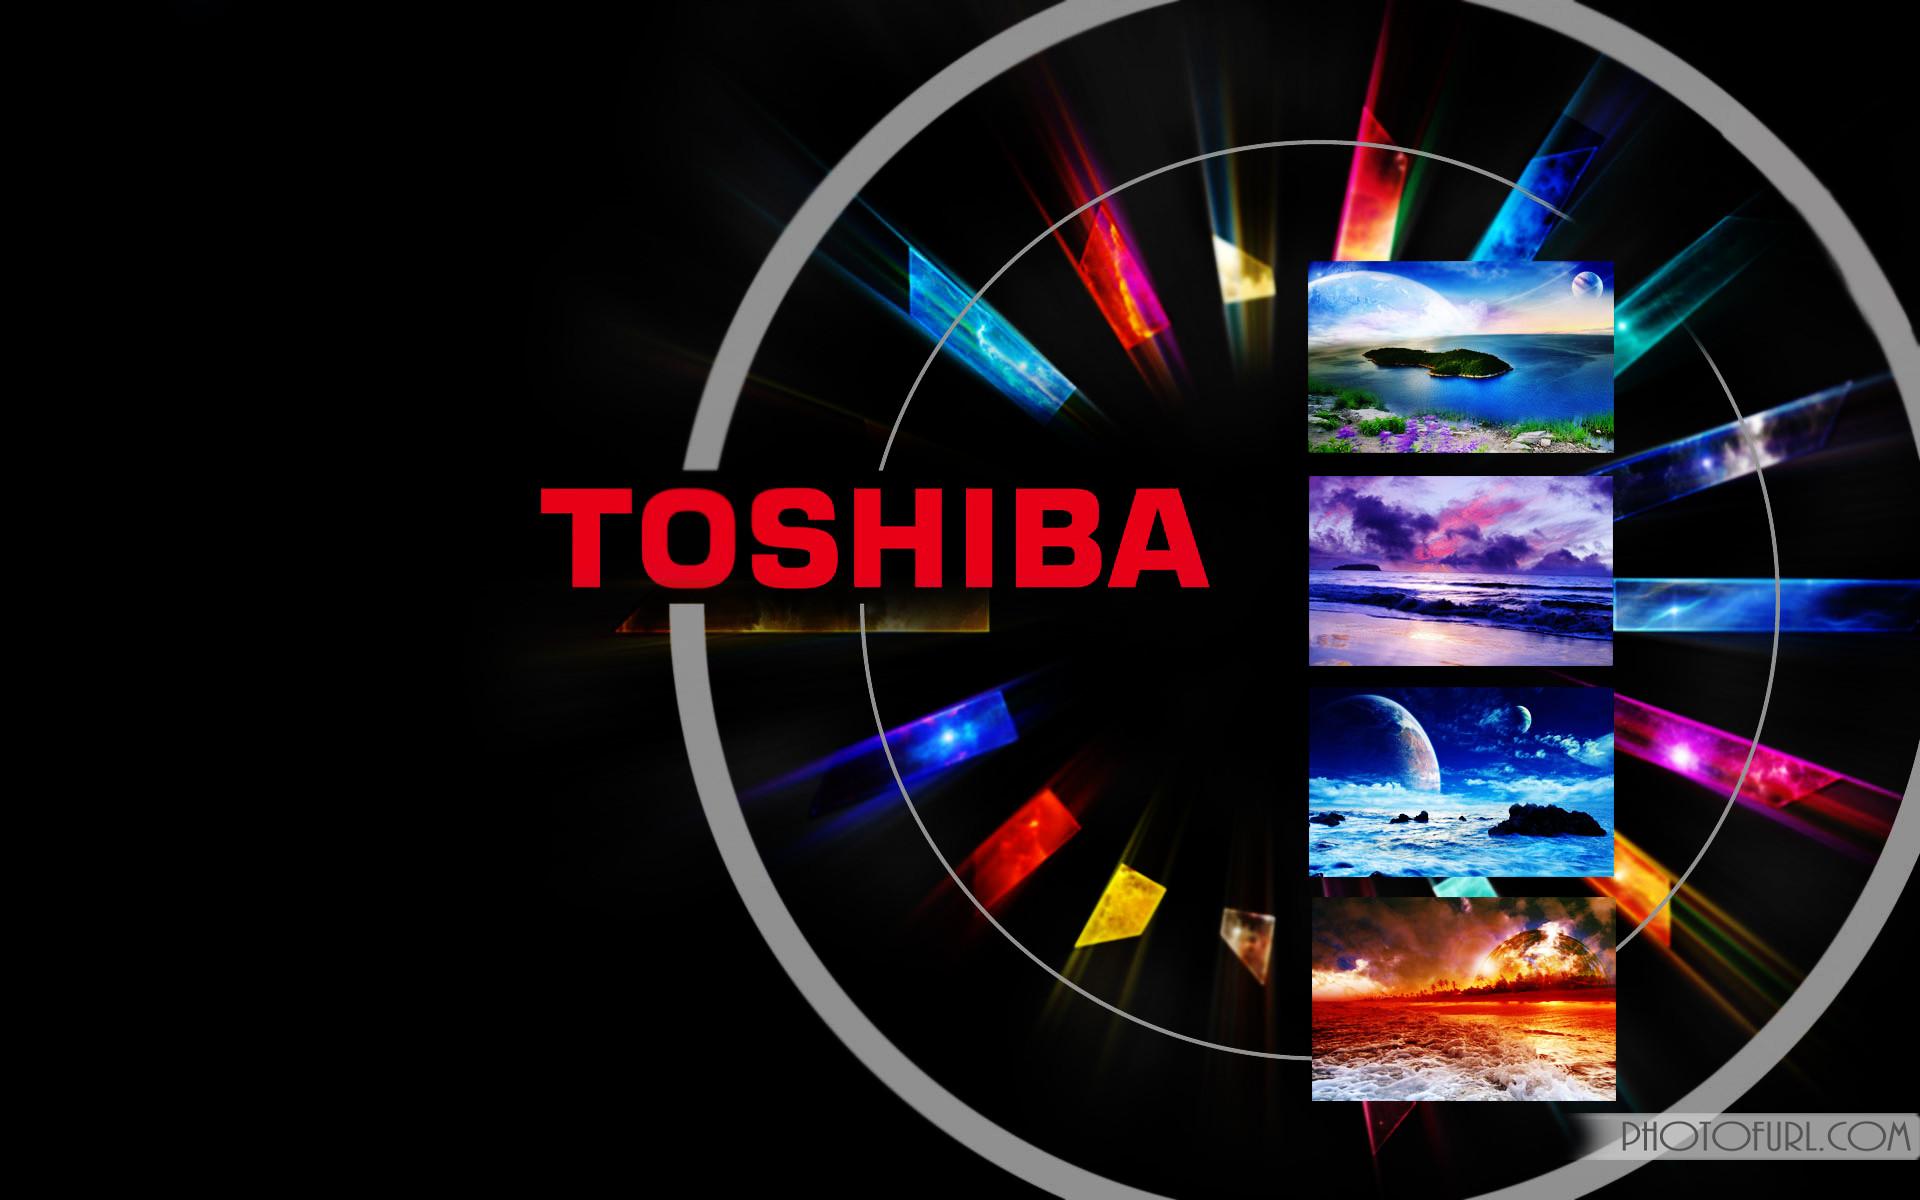 Apple iPhone Maker Bids A$37 To Rescue Toshiba   channelnews